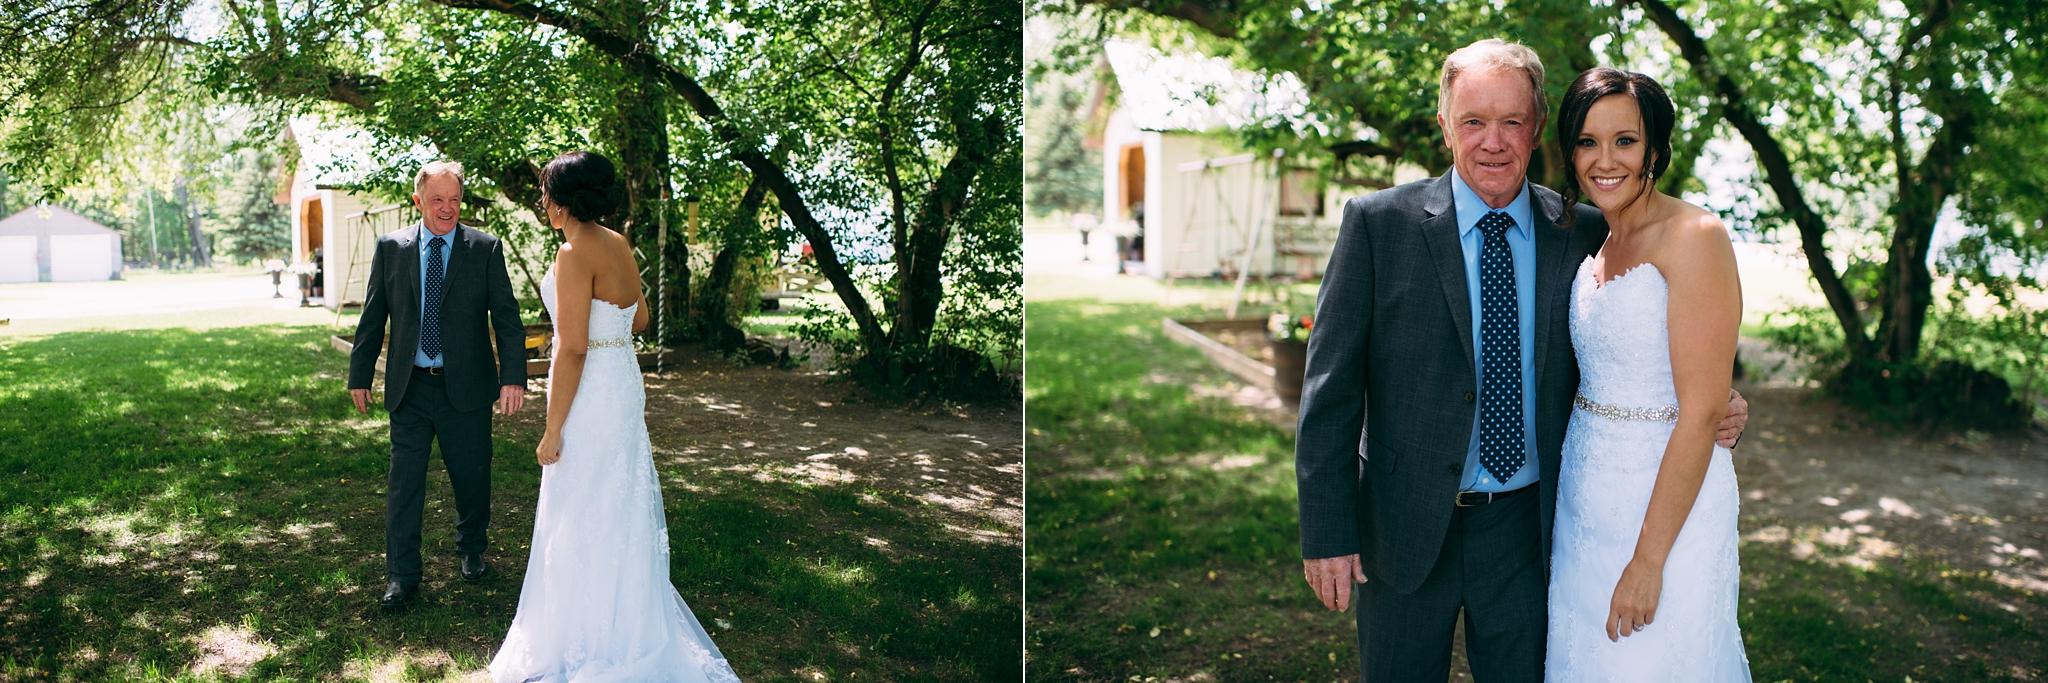 kaihla_tonai_intimate_wedding_elopement_photographer_1512